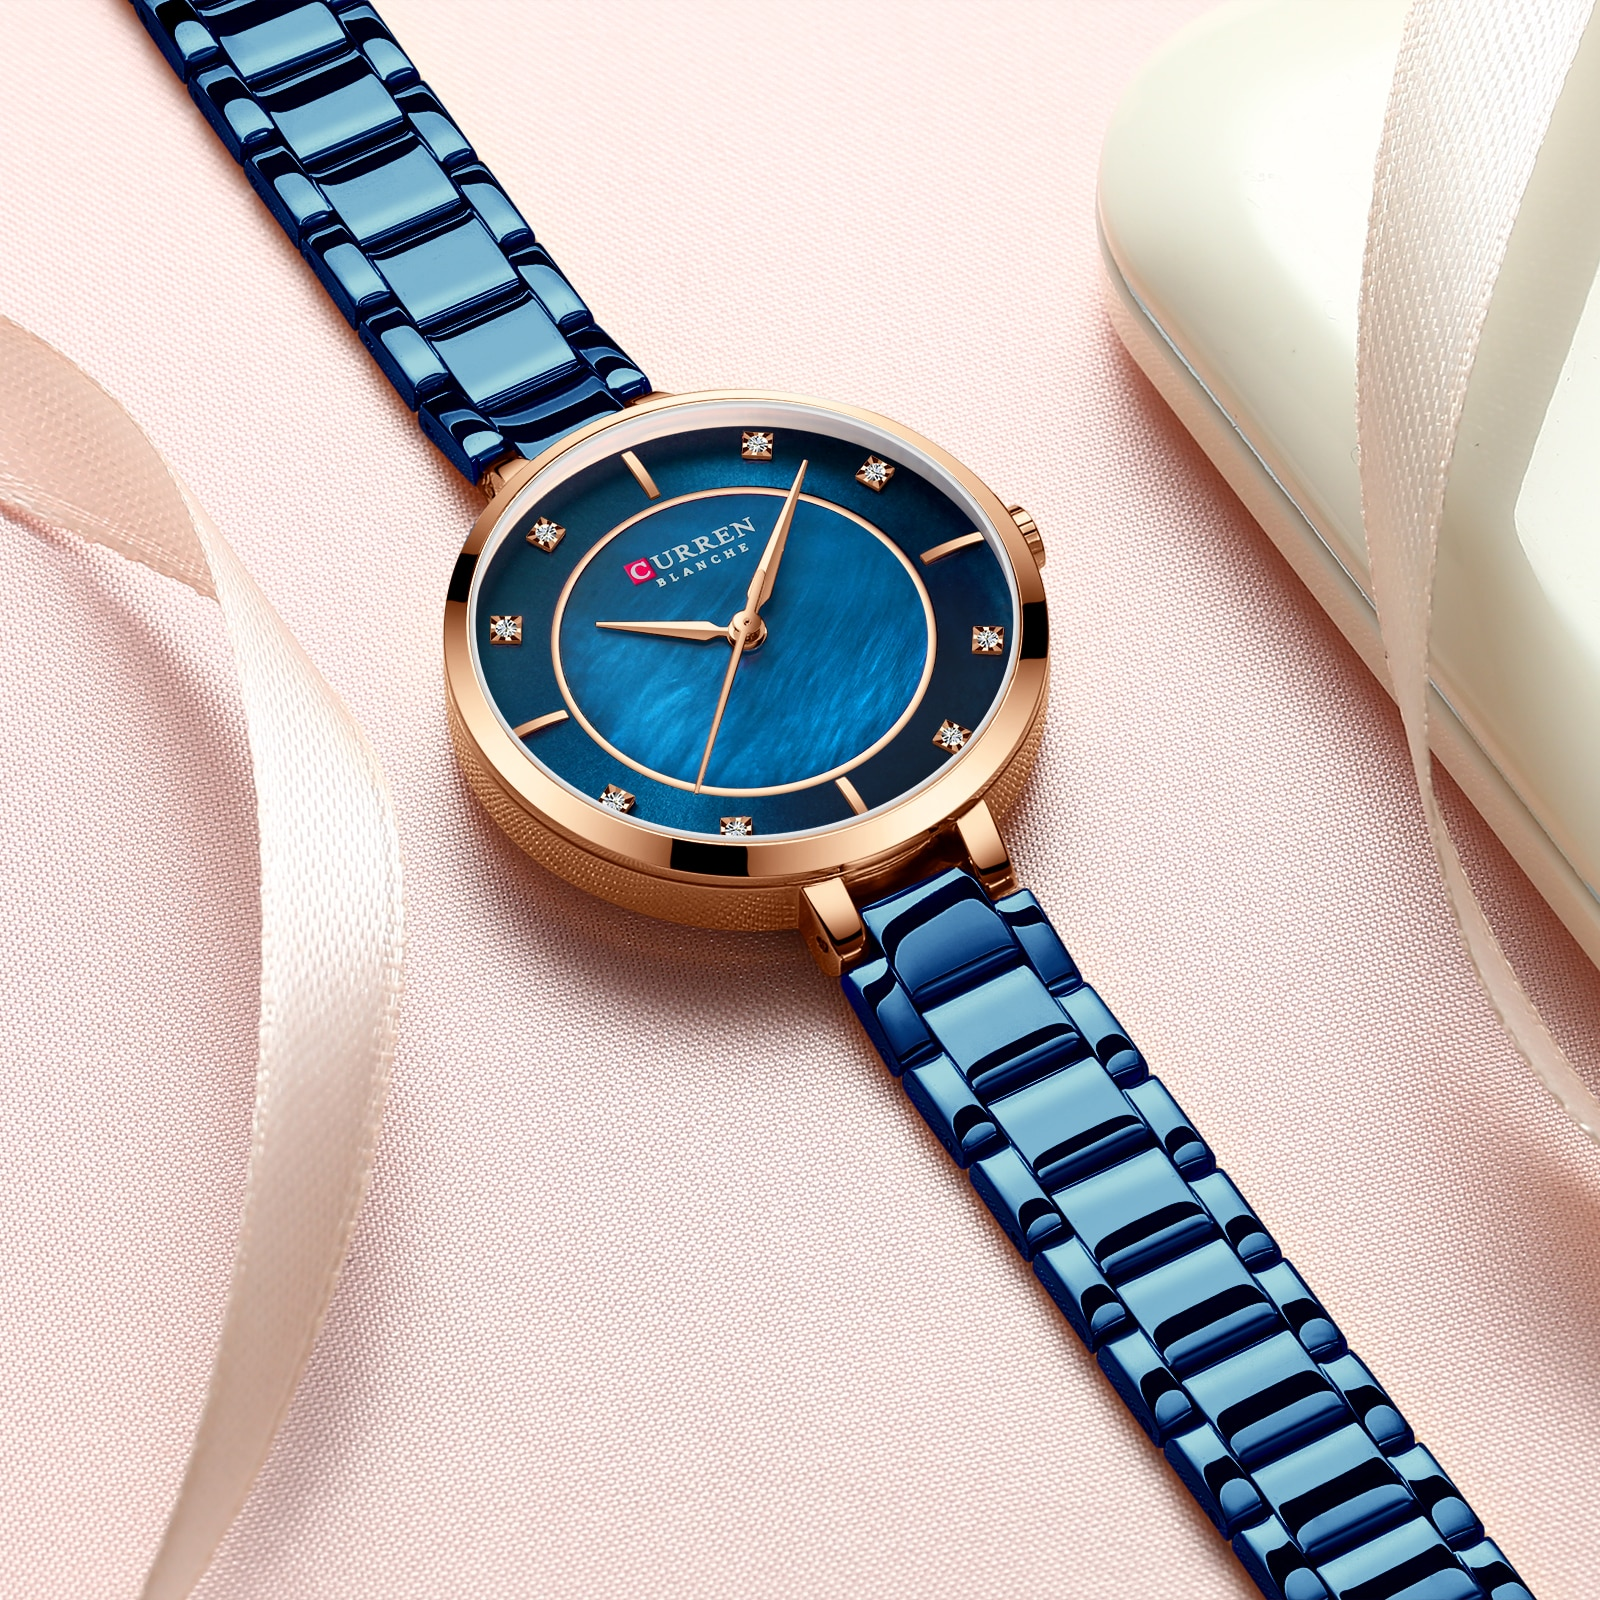 CURREN Fashion Ladies Watch Blue Stainless Steel Bracelet Rhinestone Diamond Quartz Waterproof Female Watches Clock Montre Femme enlarge